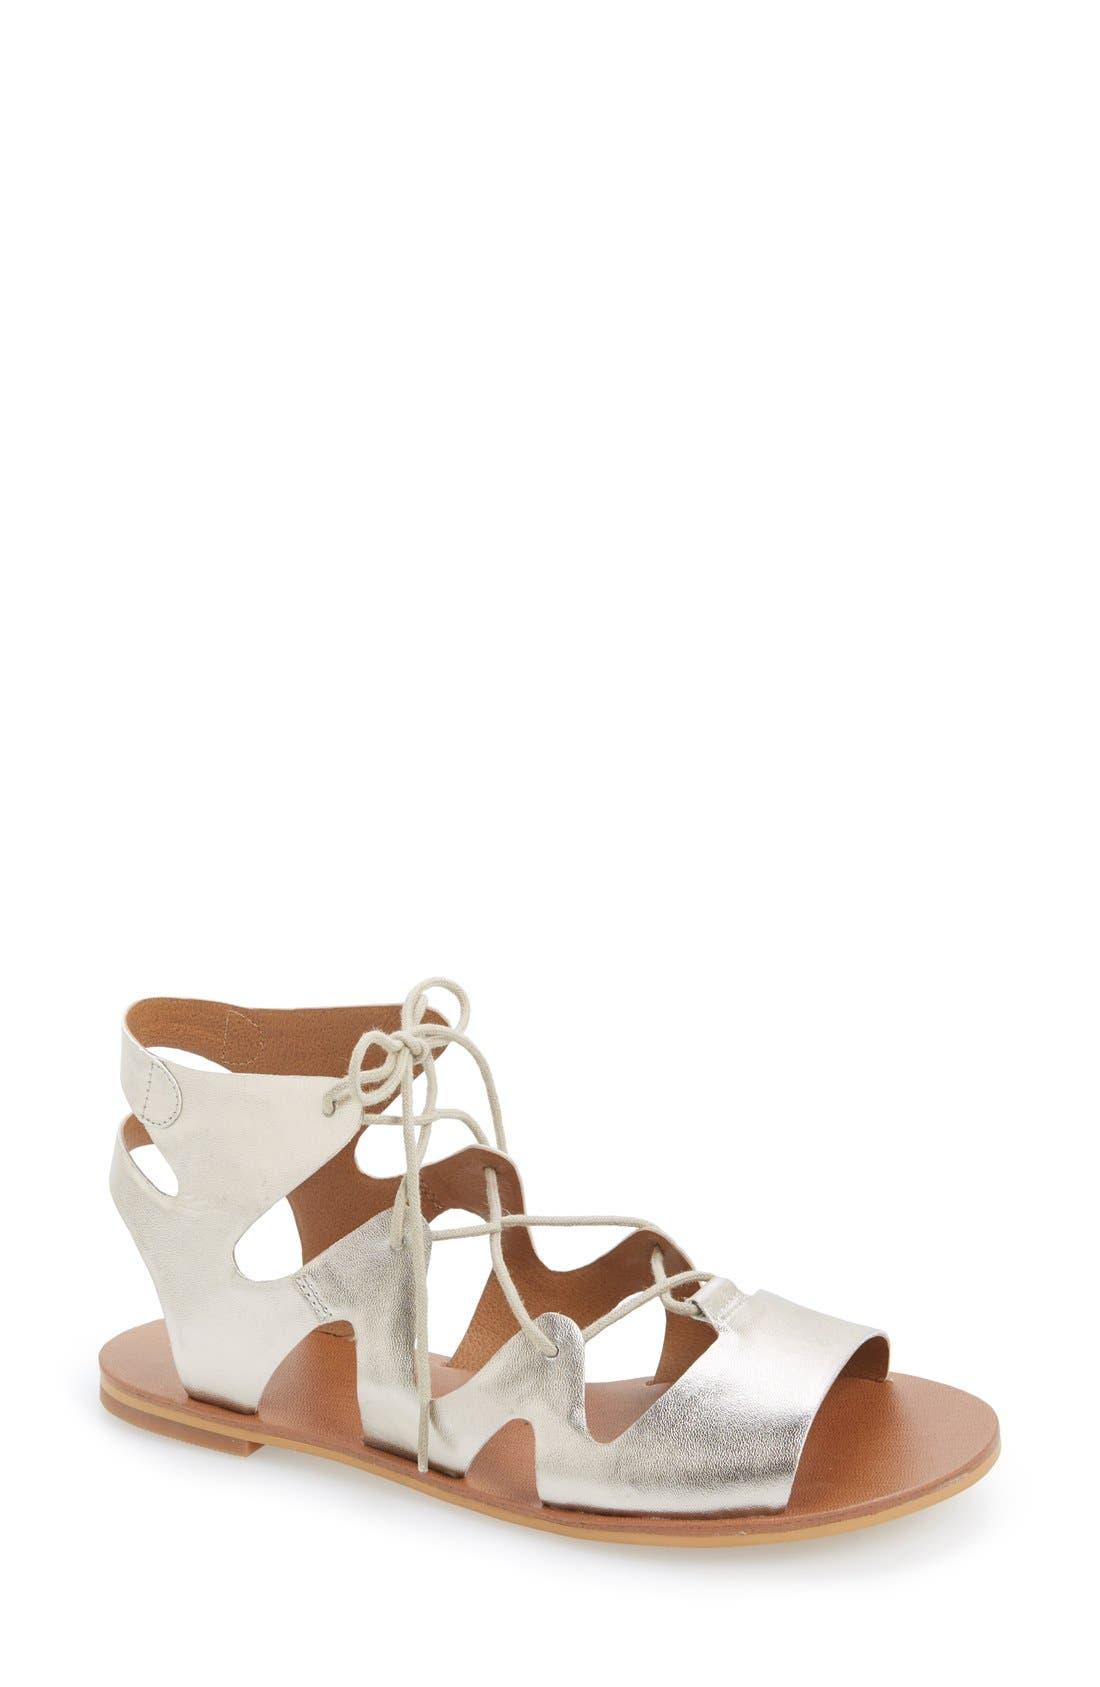 'Alyona' Lace-Up Gladiator Sandal,                         Main,                         color, Platinum Faux Leather